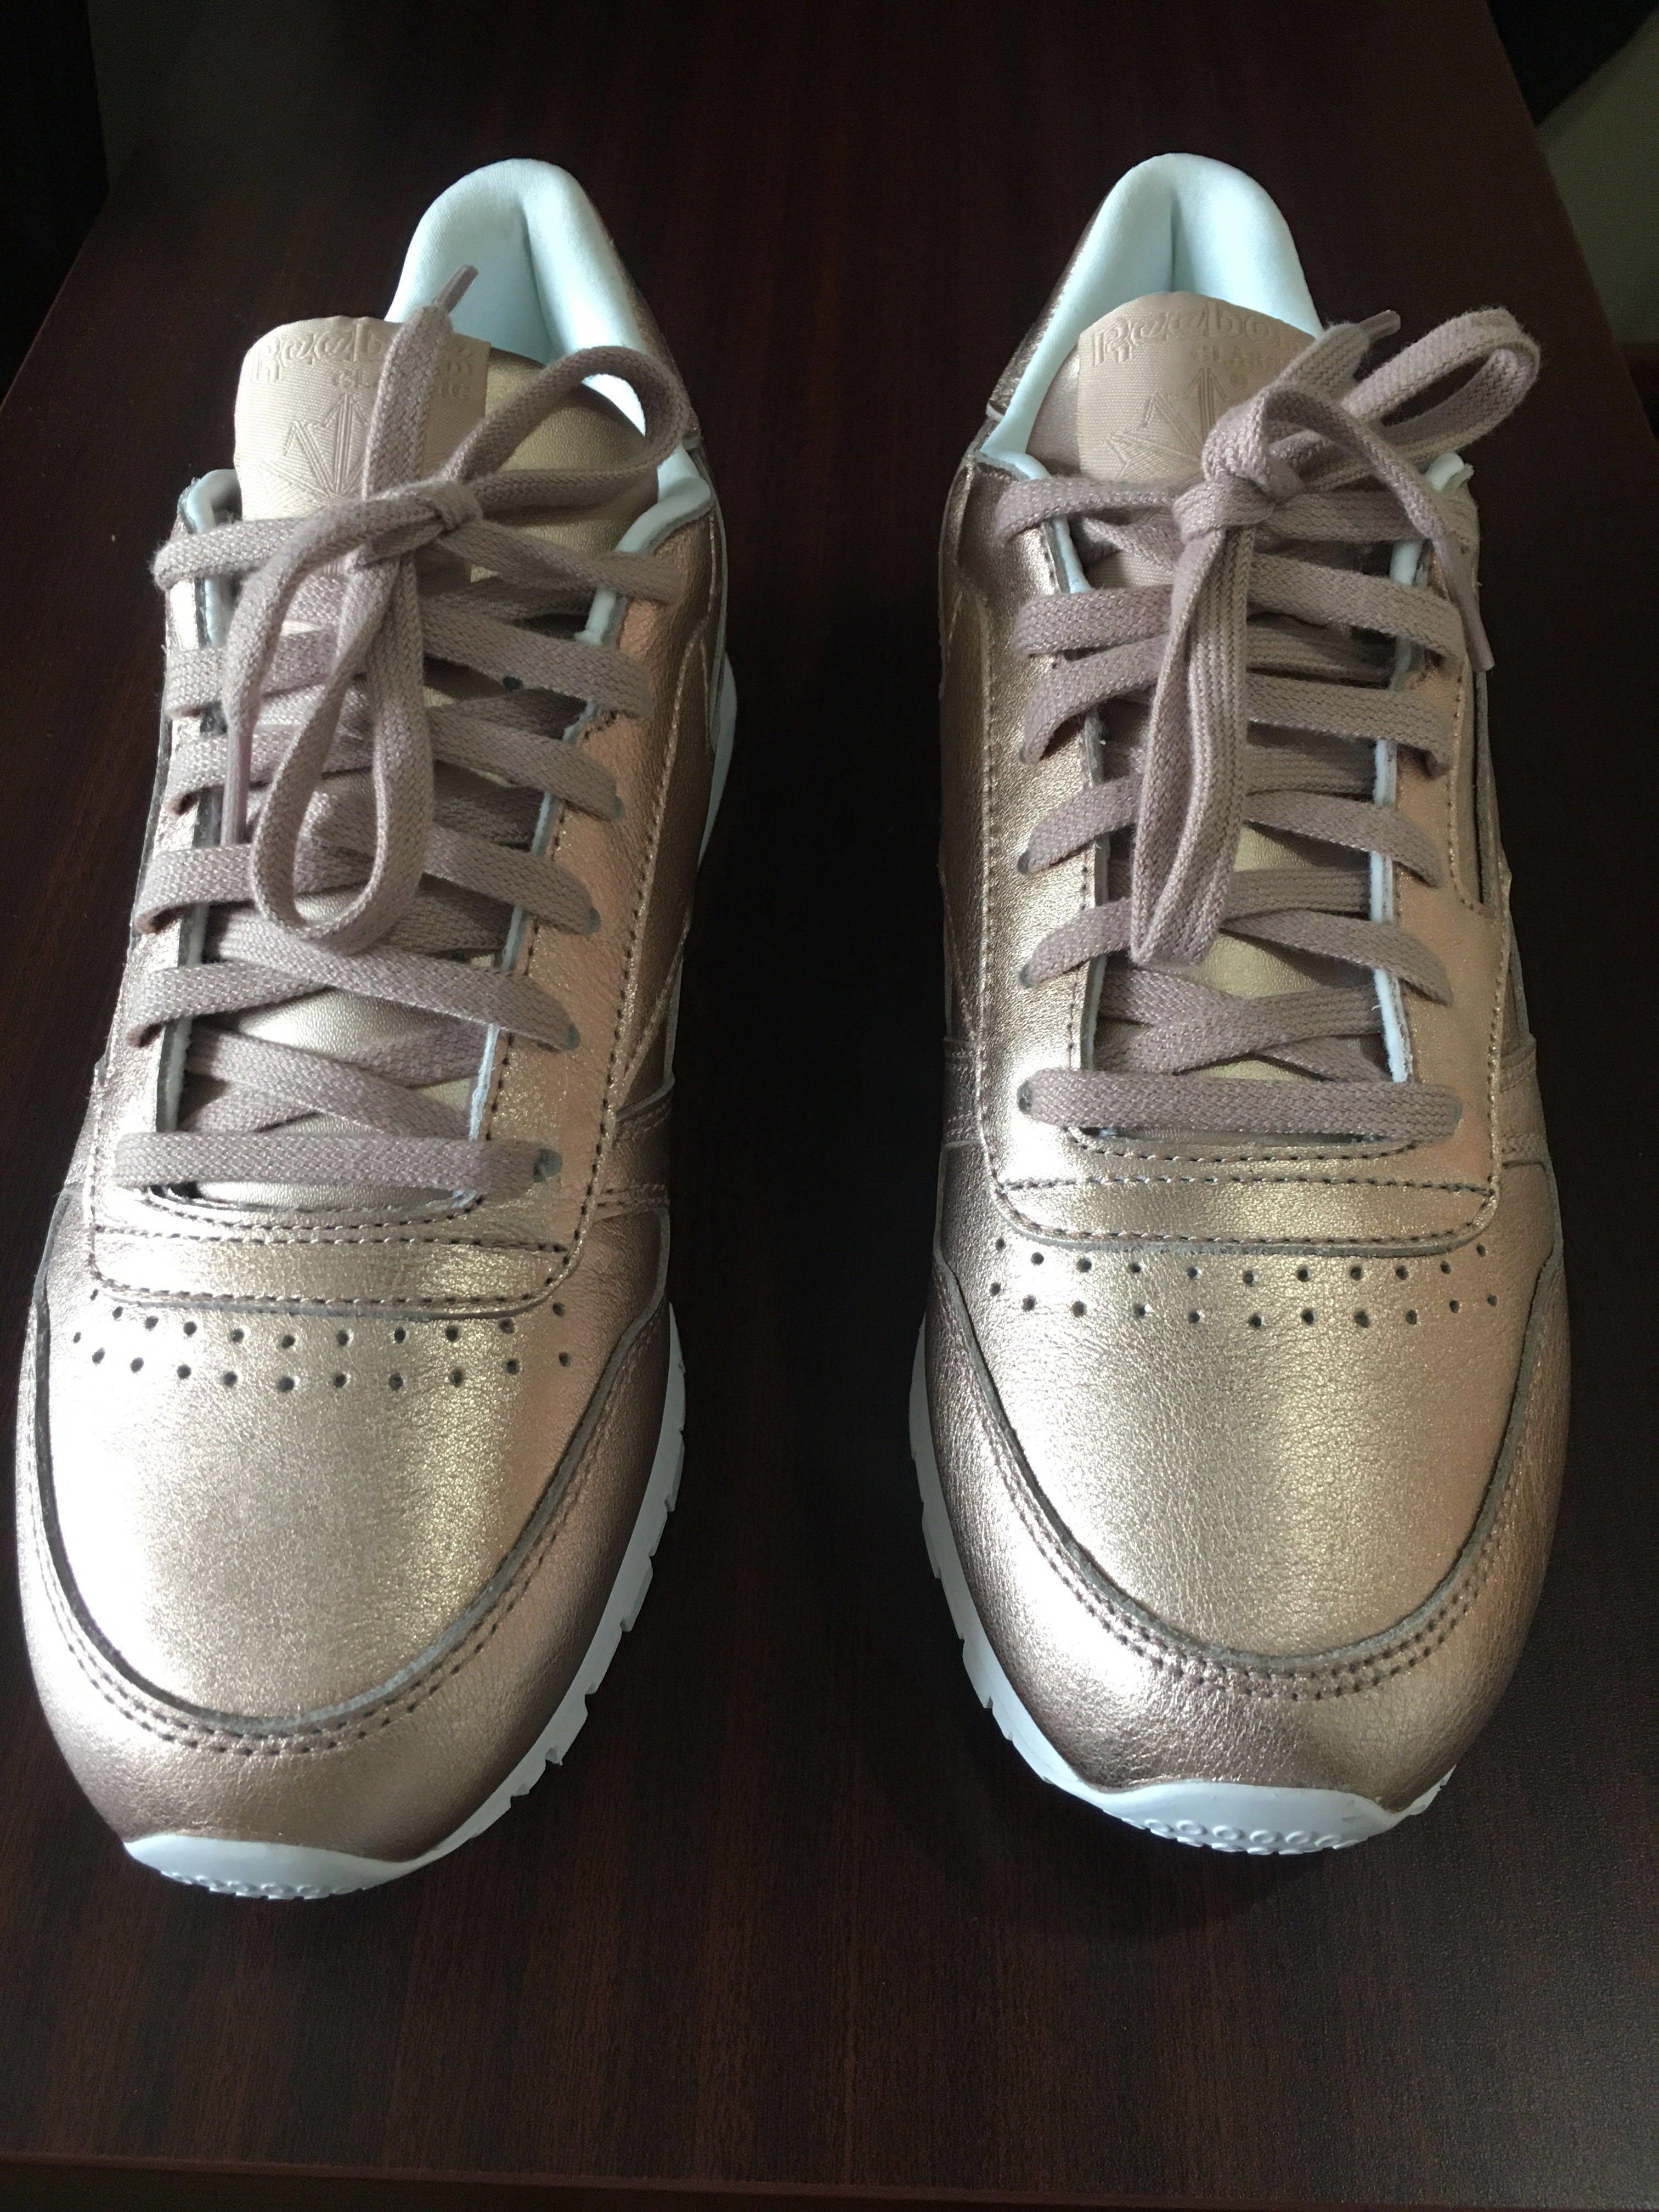 577de3a766b8a CUT DOWN  BN Reebok Classic Leather Melted Metal